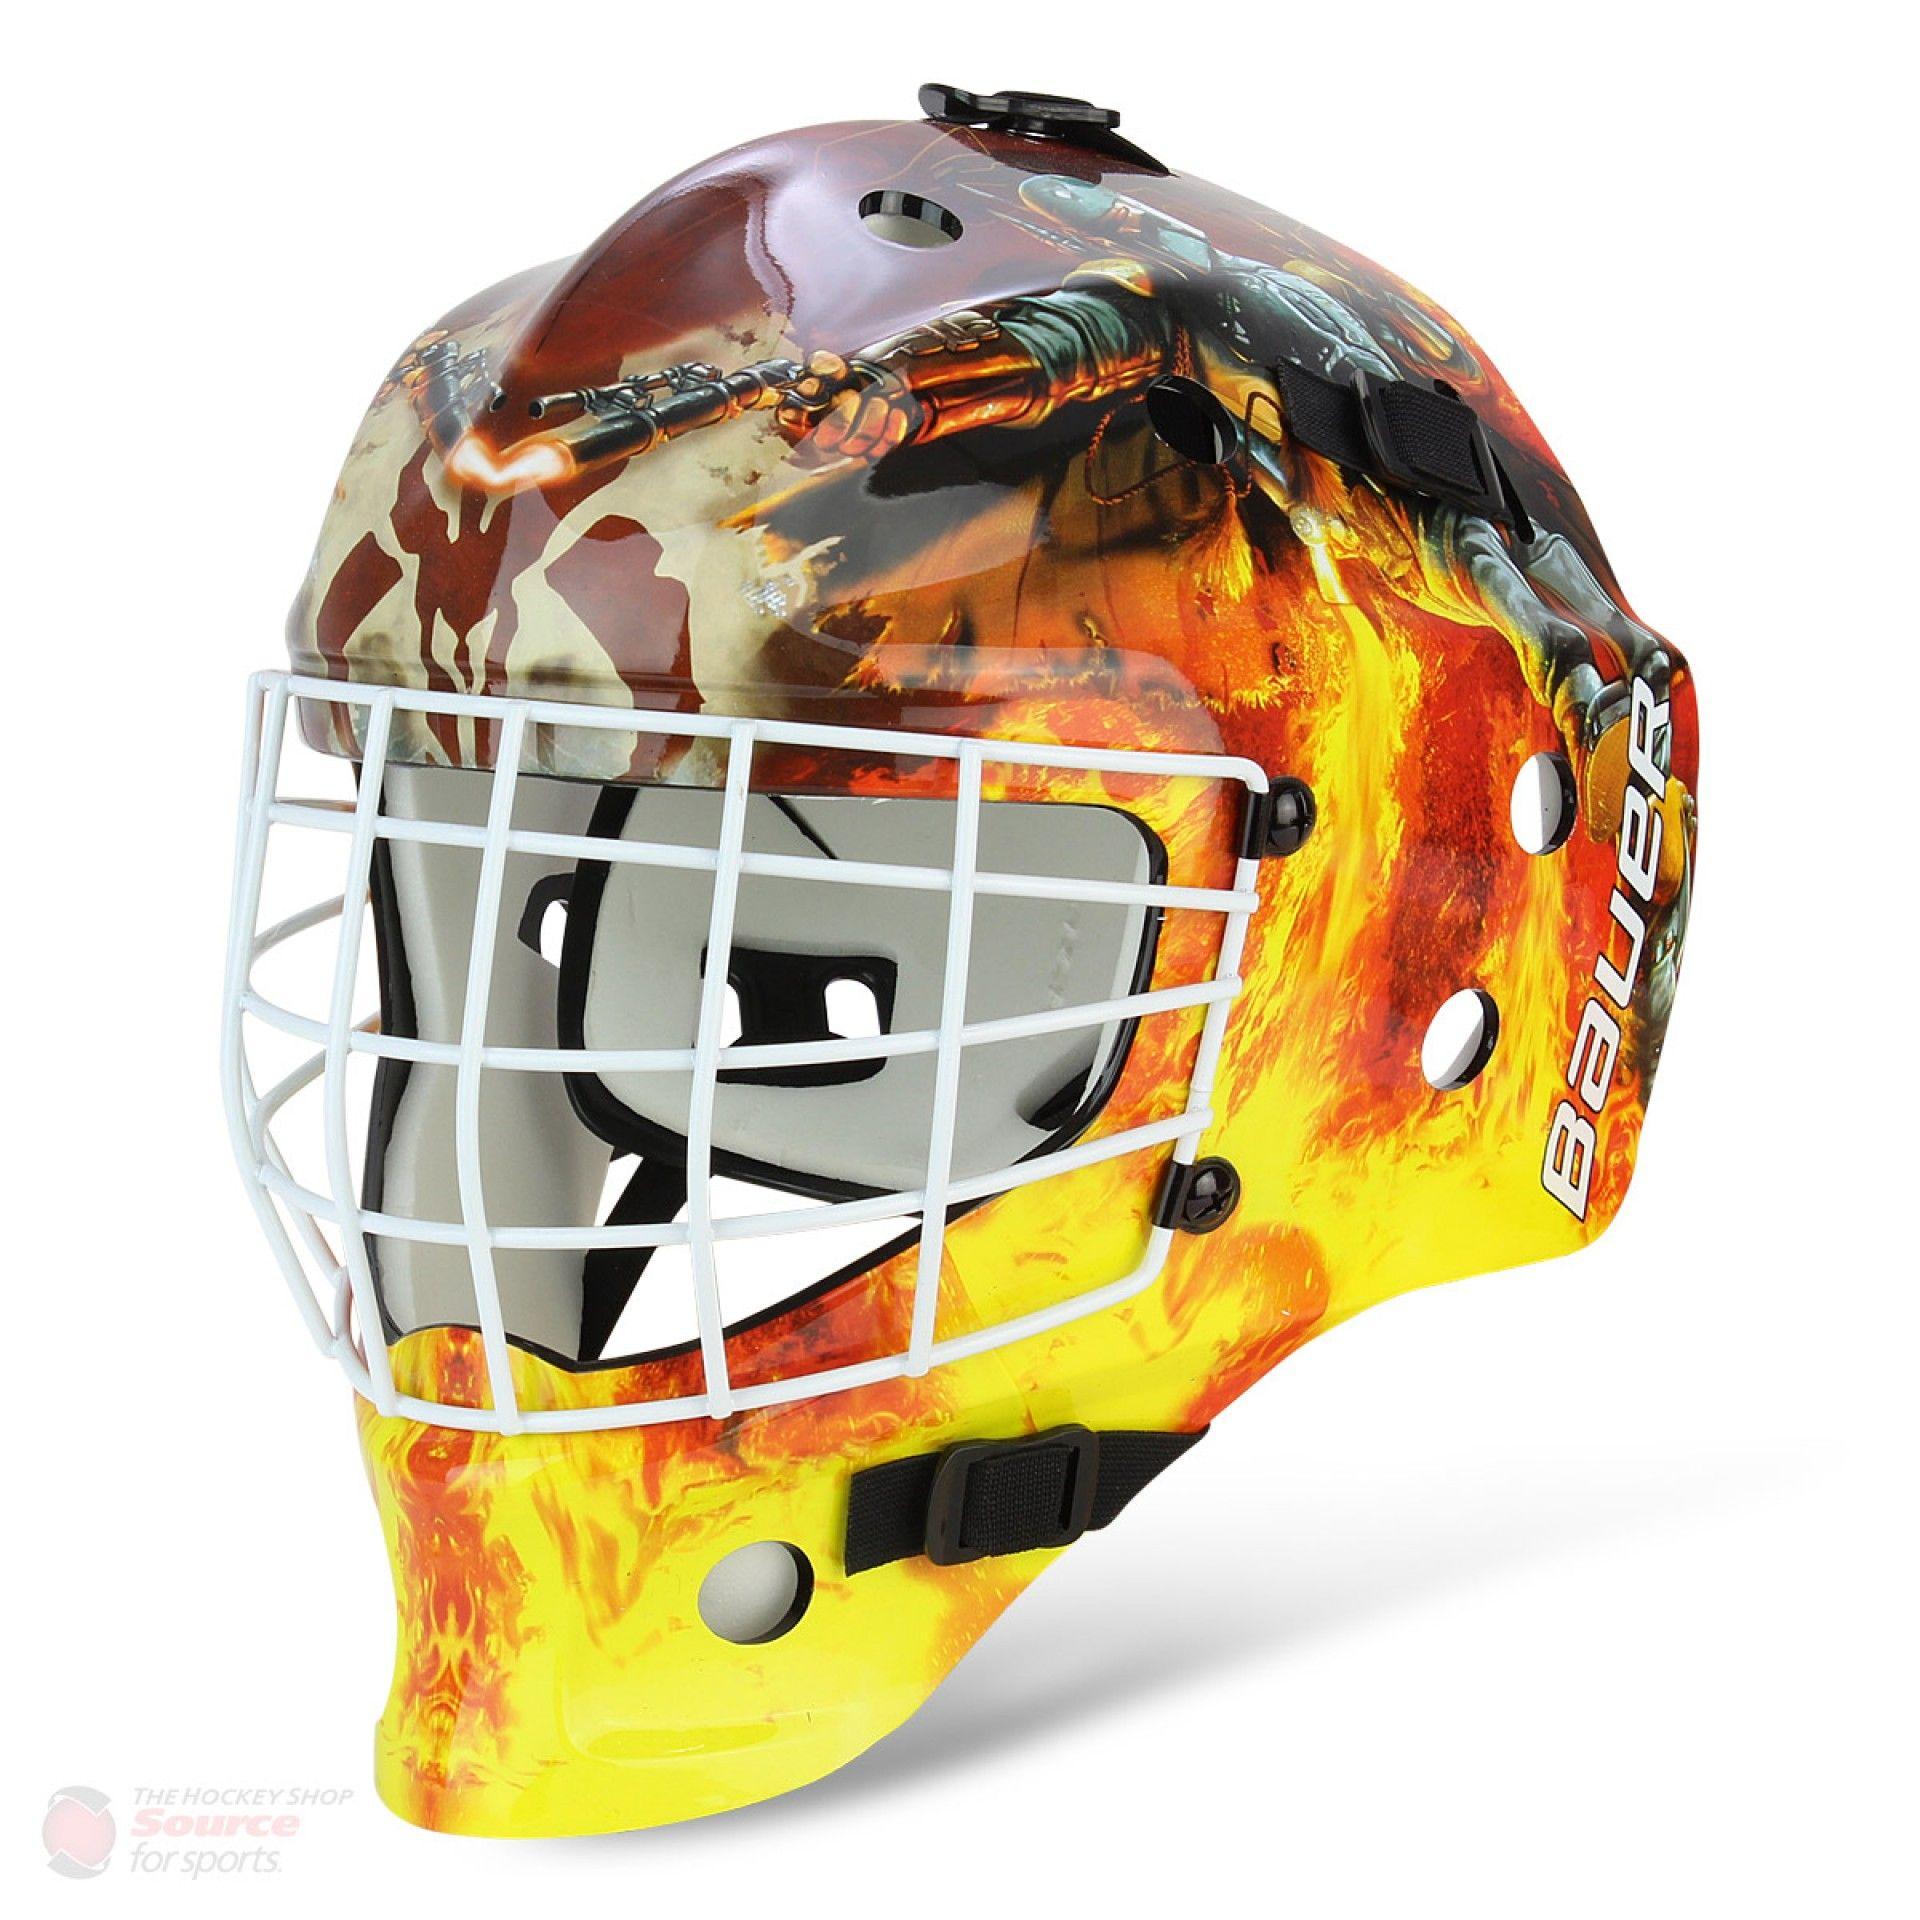 27 Beliebte Sensationell Clearance Hockey Ausrustung Die Funken Konnen Ideen Fur Jedermann Hockeys Info Hockey Ausrustung Hockey Nhl